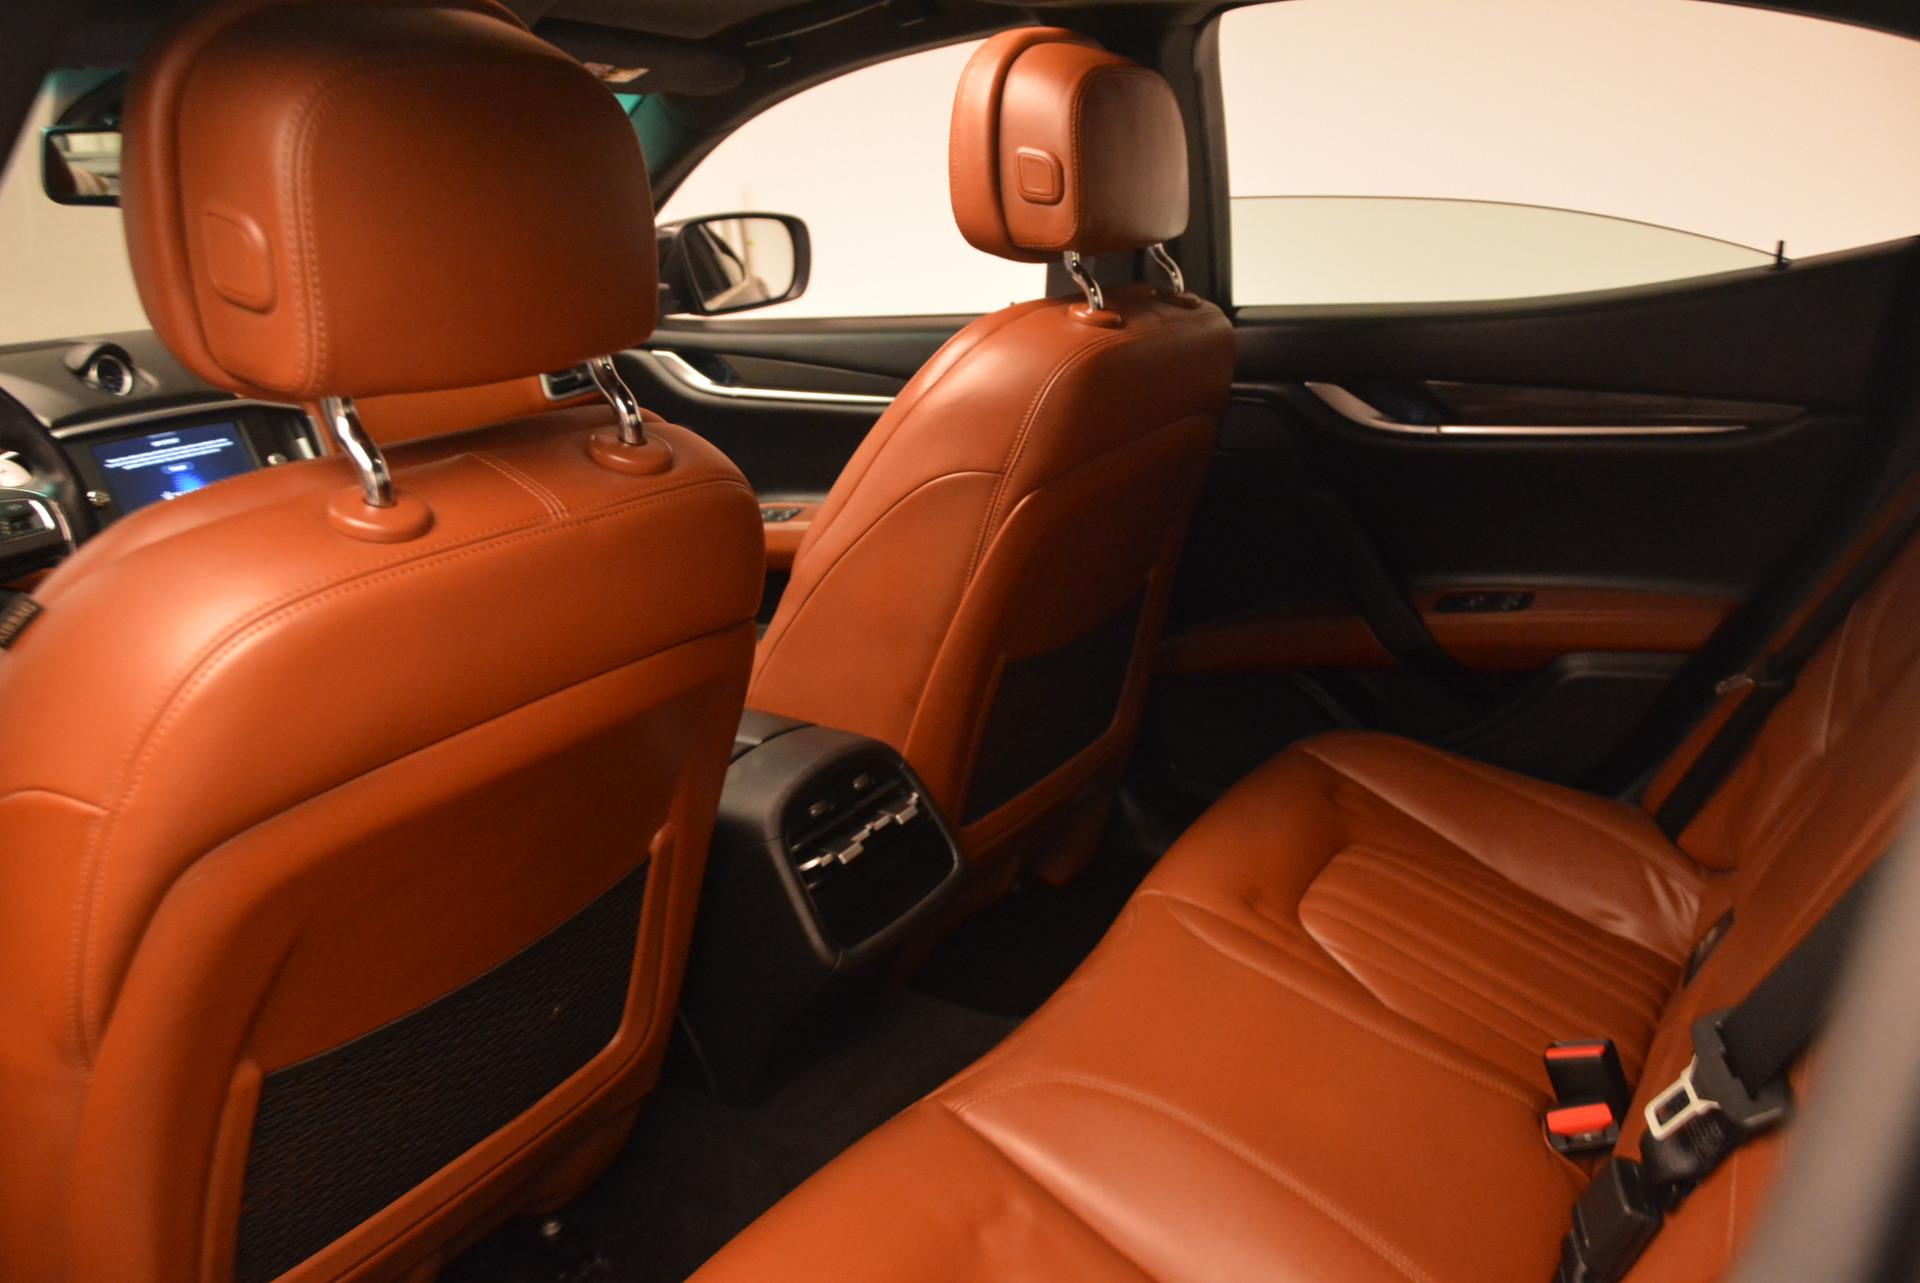 Used 2014 Maserati Ghibli S Q4 For Sale In Greenwich, CT 805_p19